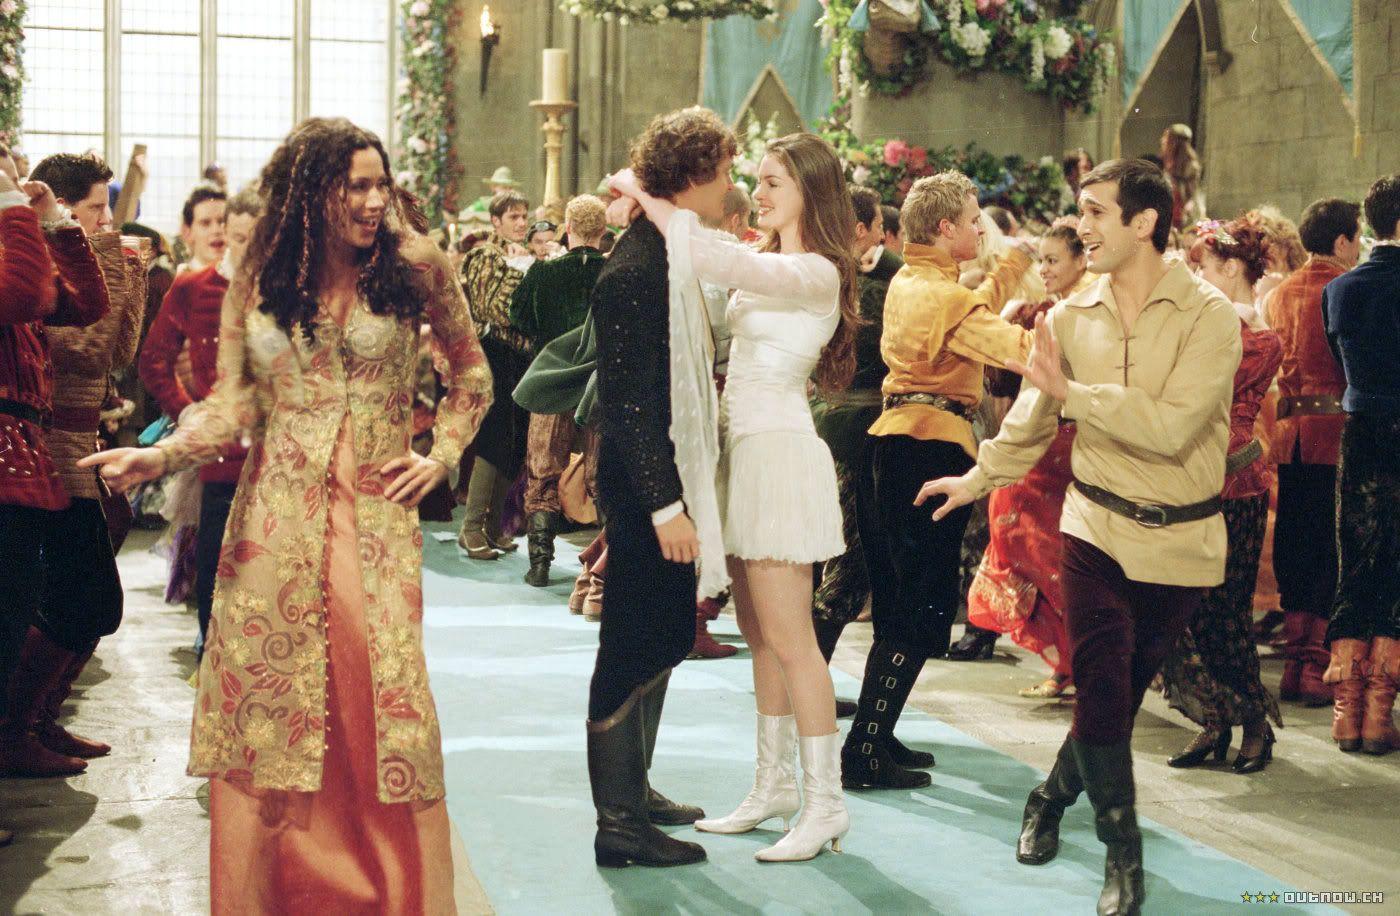 Ella Enchanted (2004) with Anne Hathaway as Ella and Hugh Dancy as ...